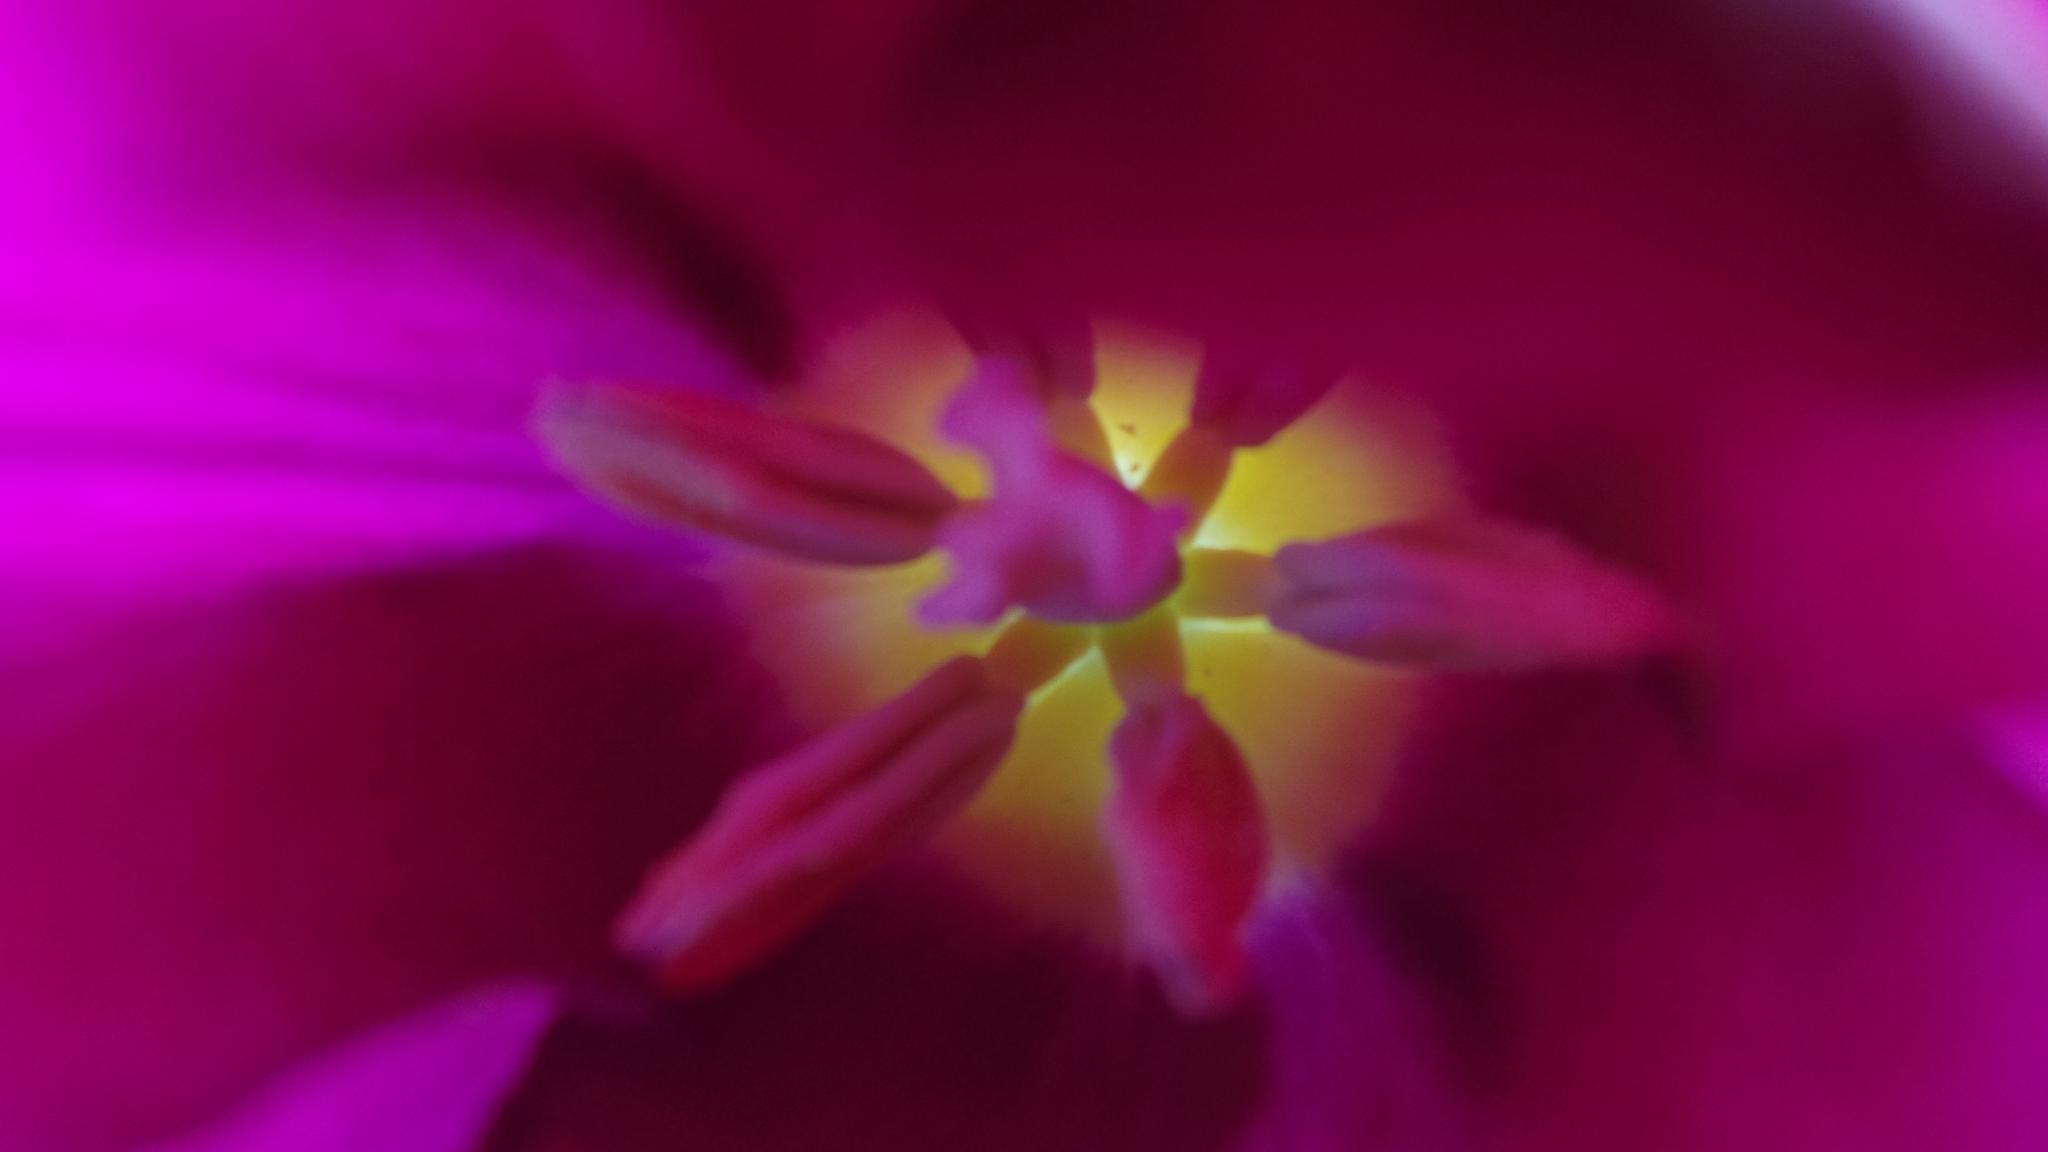 Inside the Tulip by Penelope Bailey